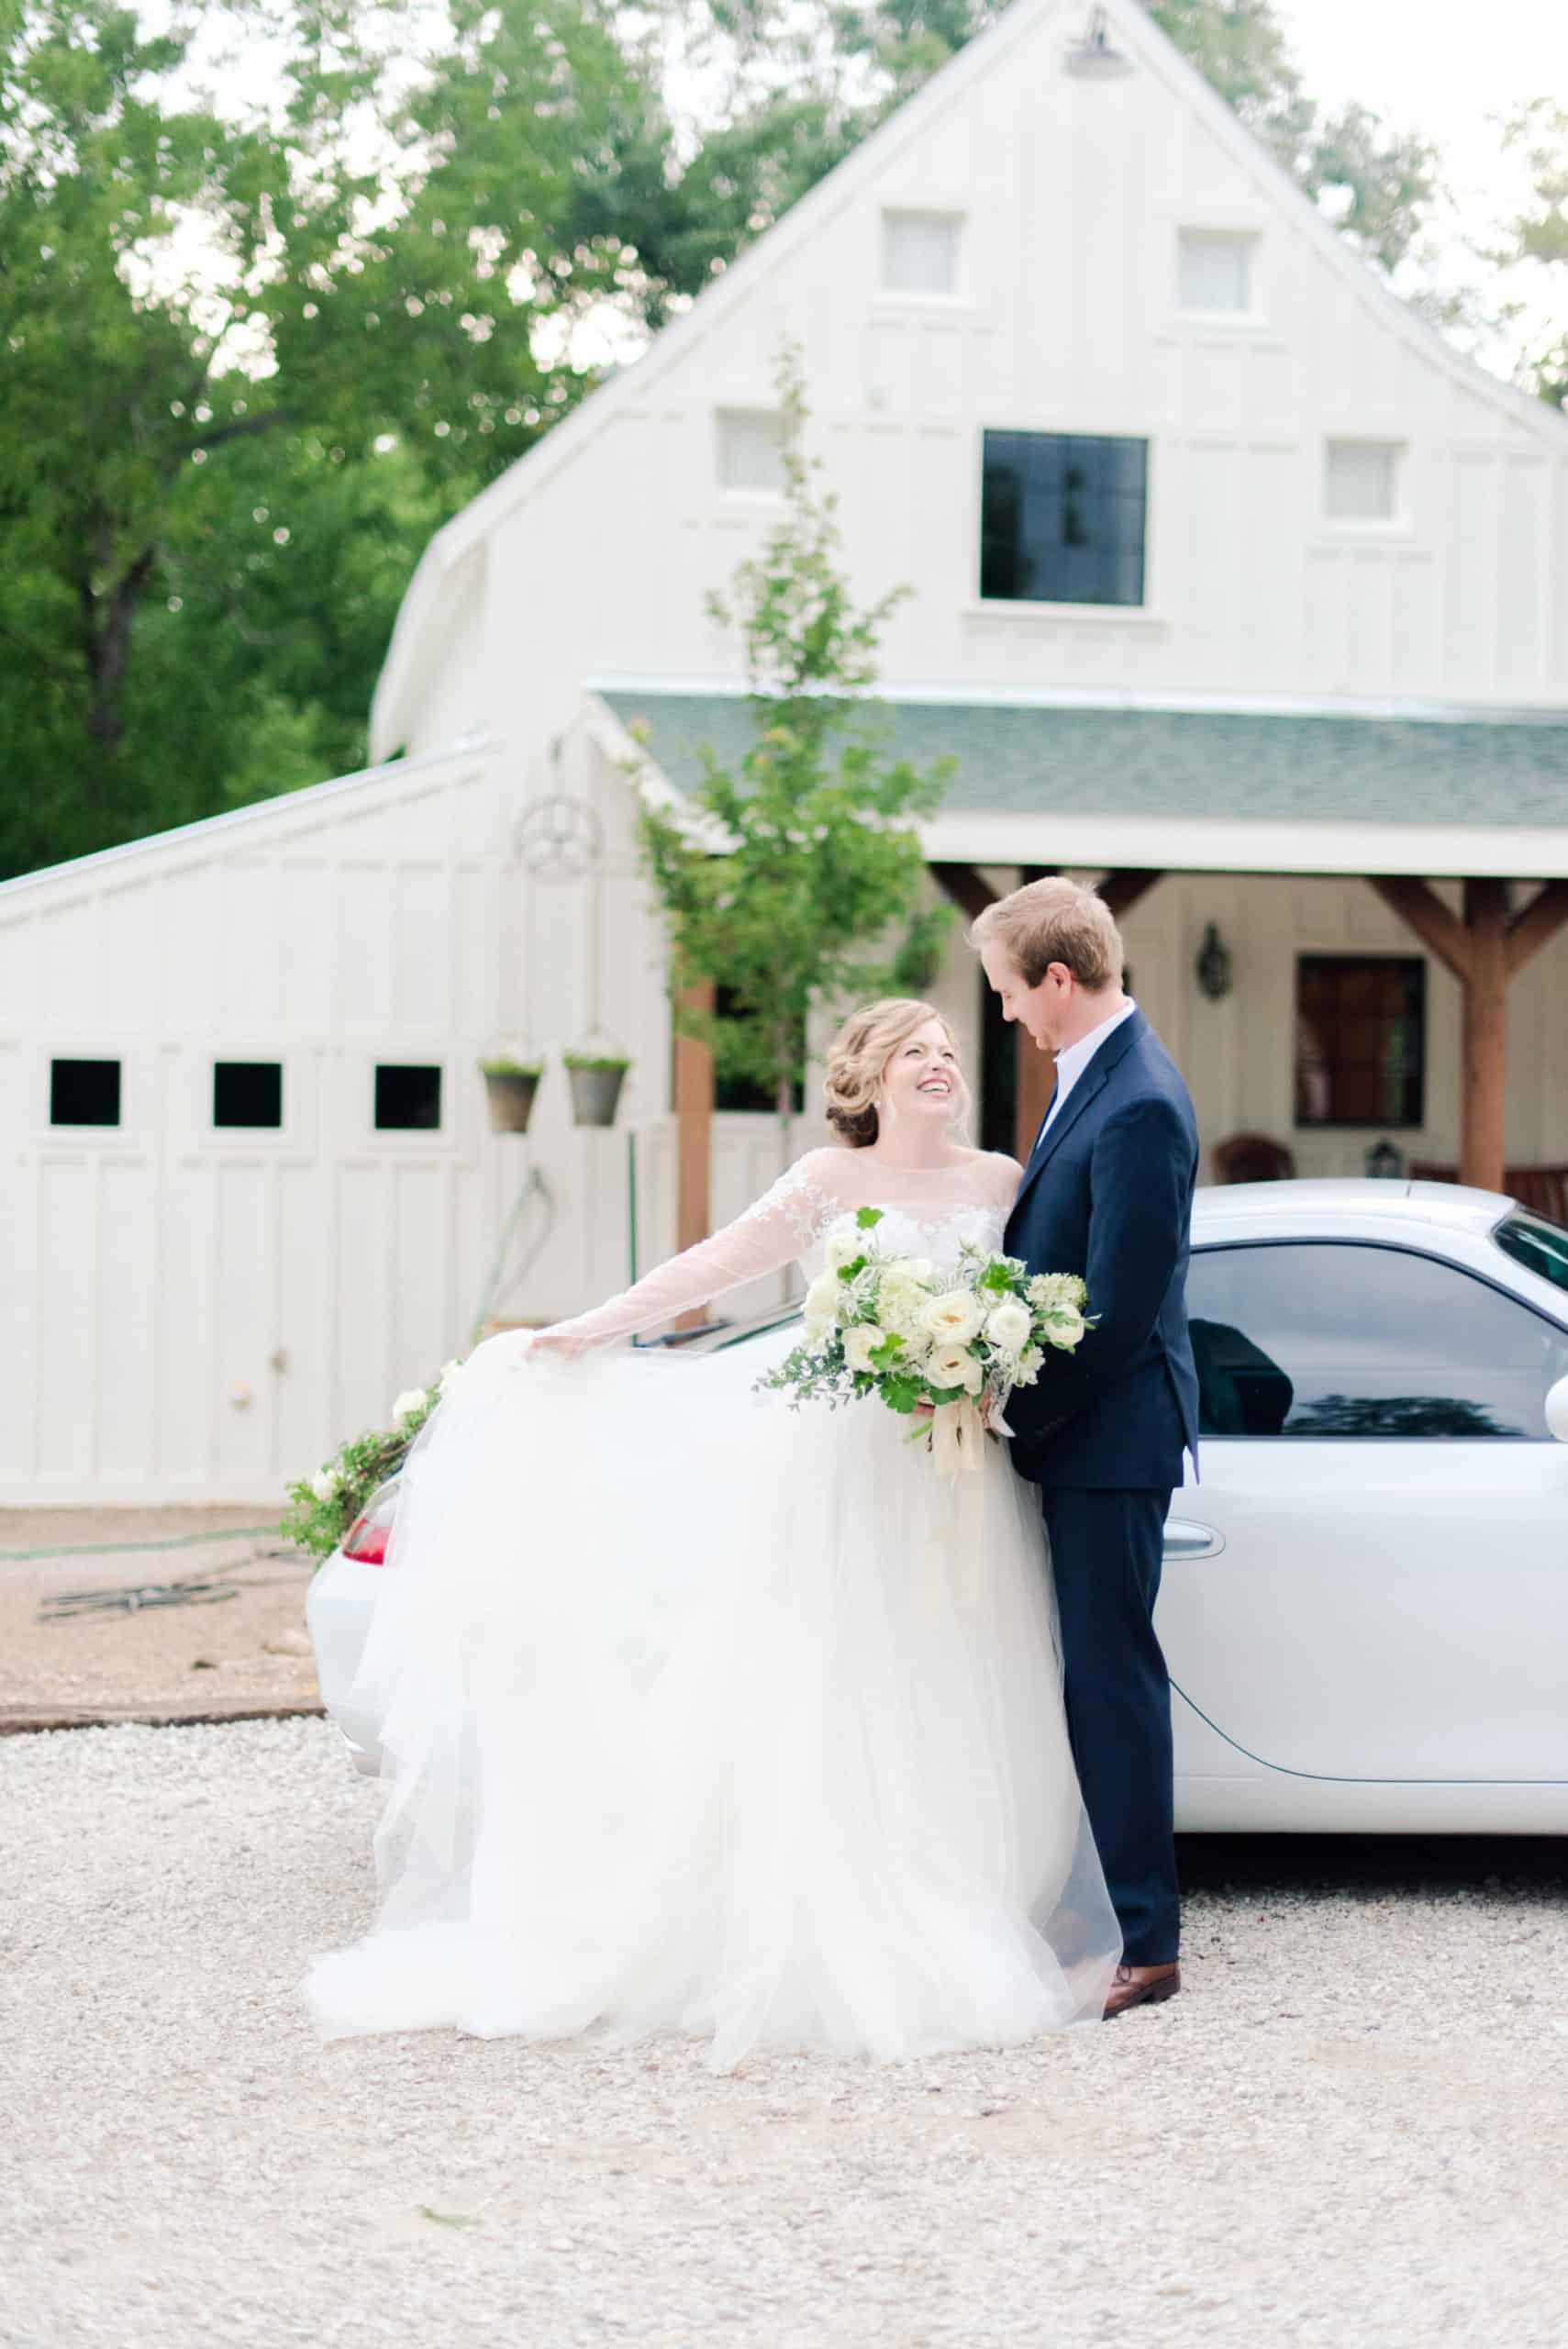 white-on-white-tulle-dress-by-casablanca-bridal-from-savvy-bridal-at-barn-at-riverbend-kansas-city